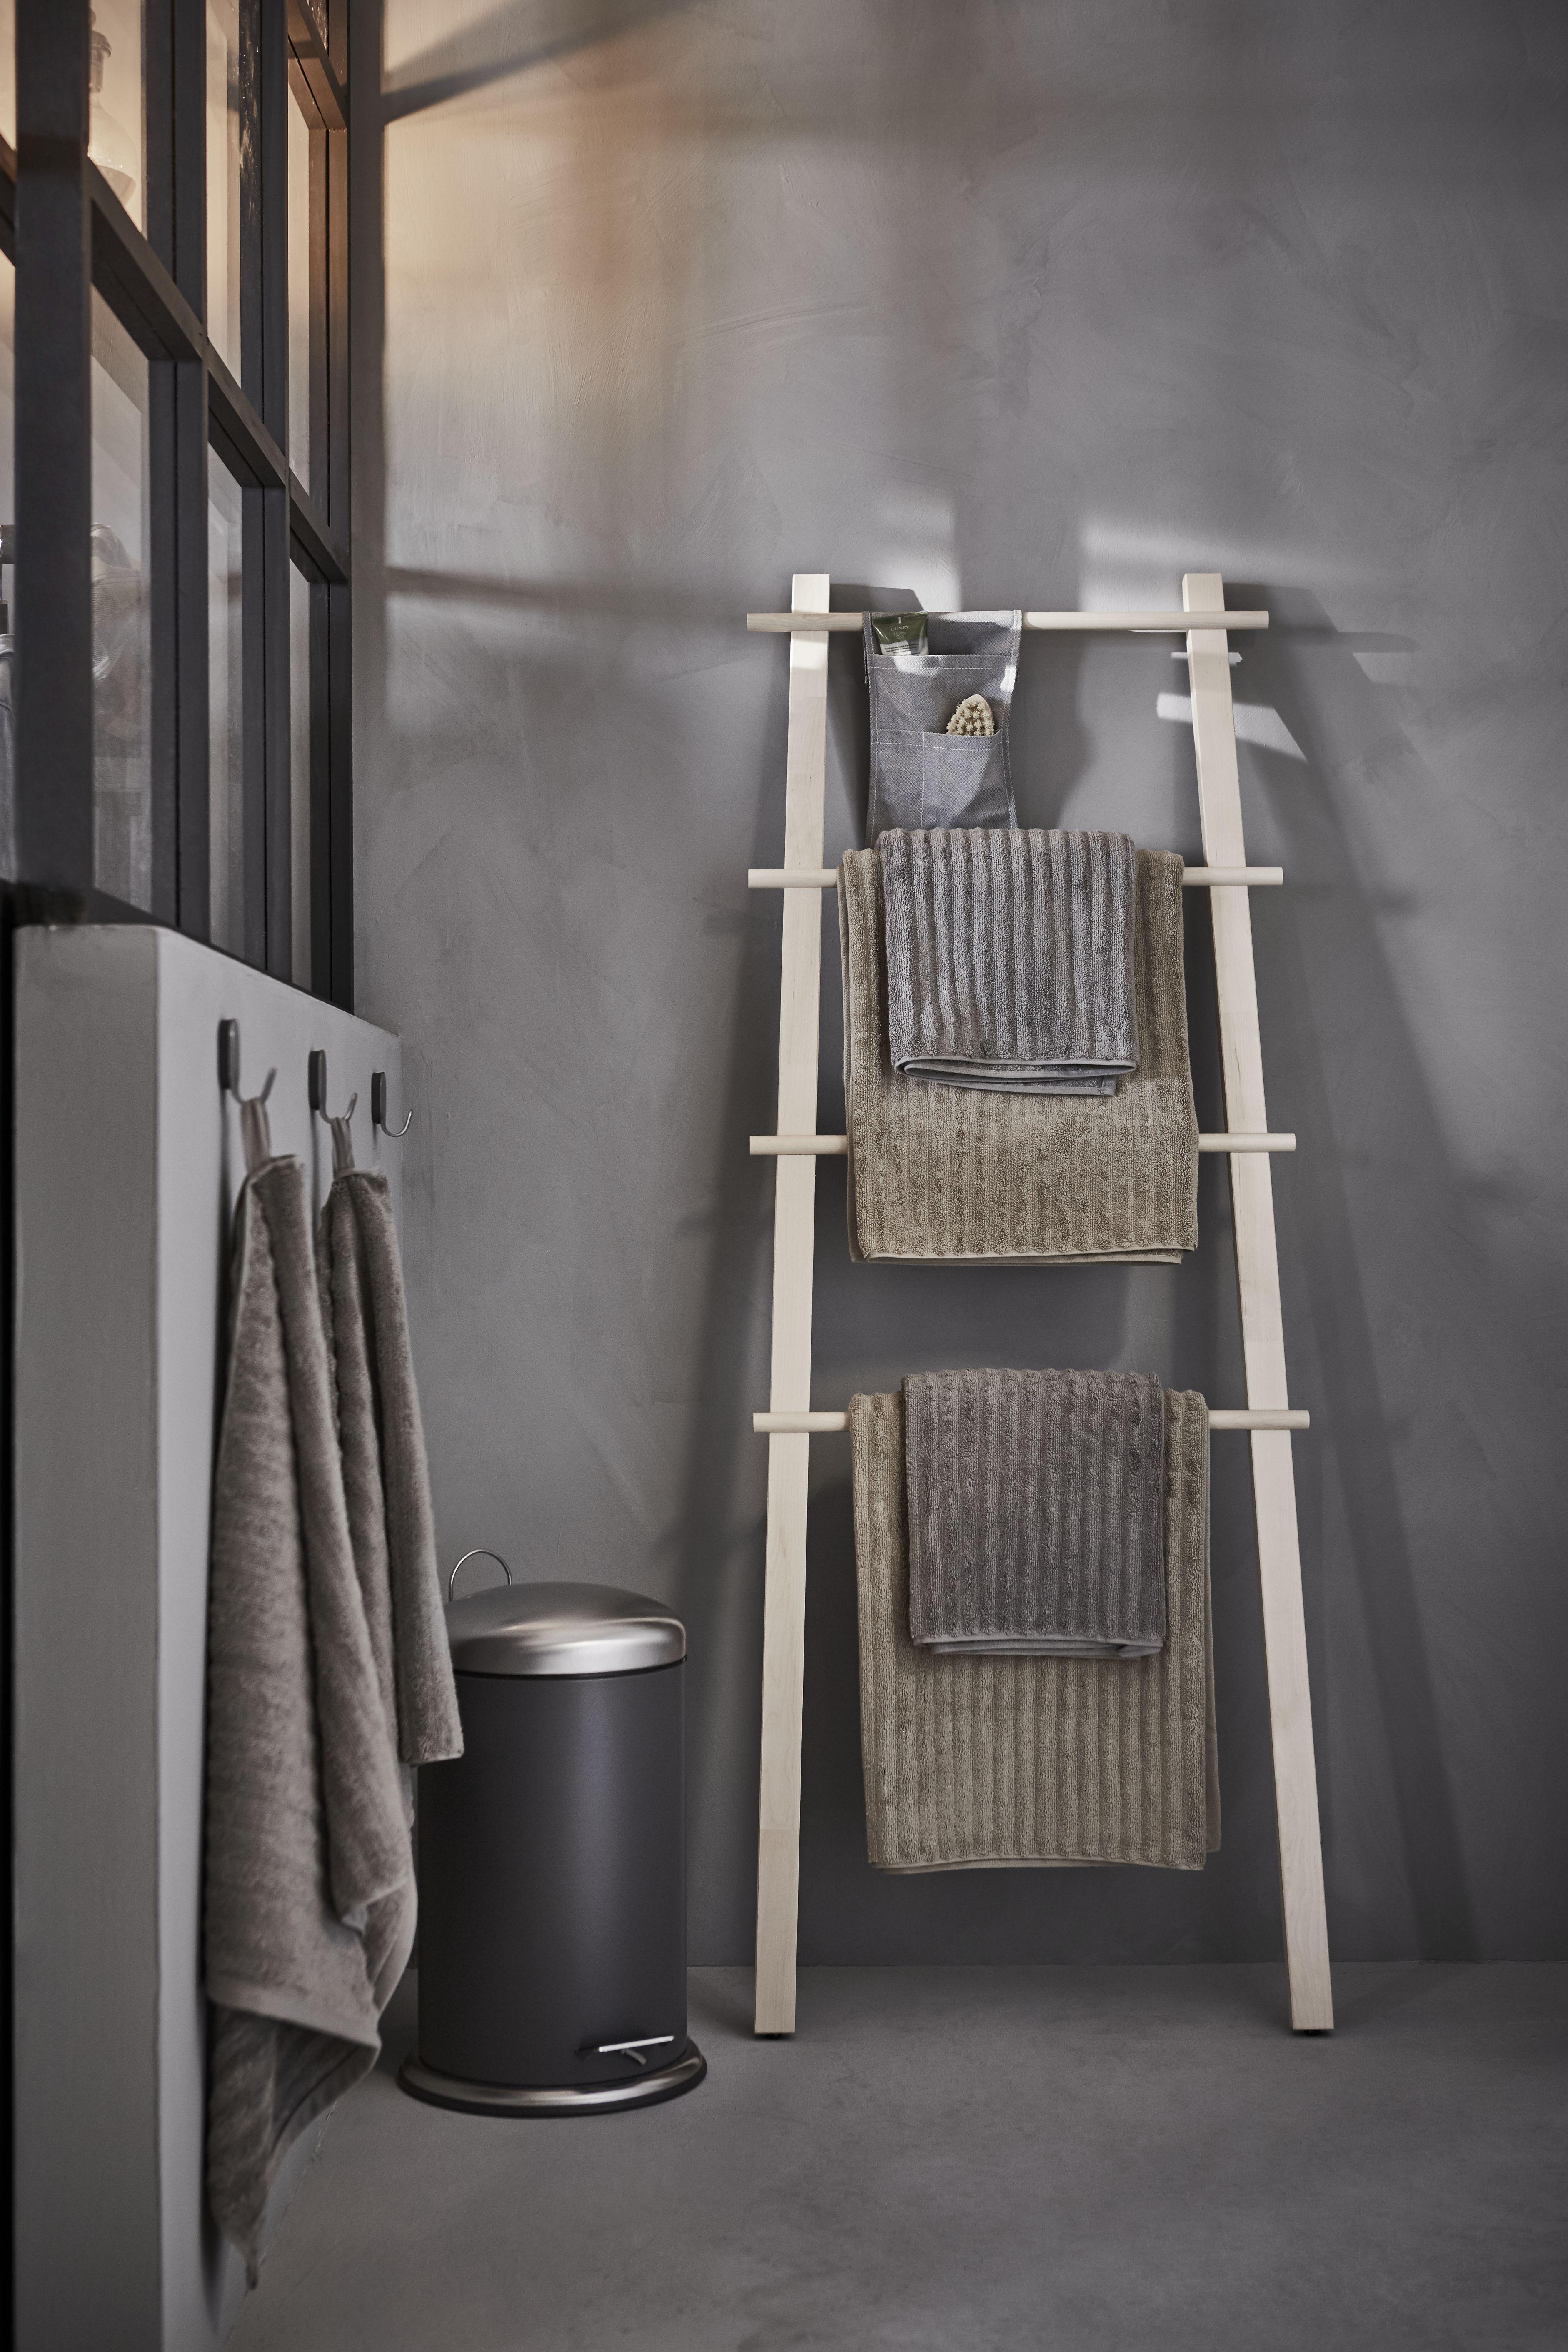 Vilto Towel Stand Birch Ikea Switzerland Ikea Ikea Bathroom Towel Rack